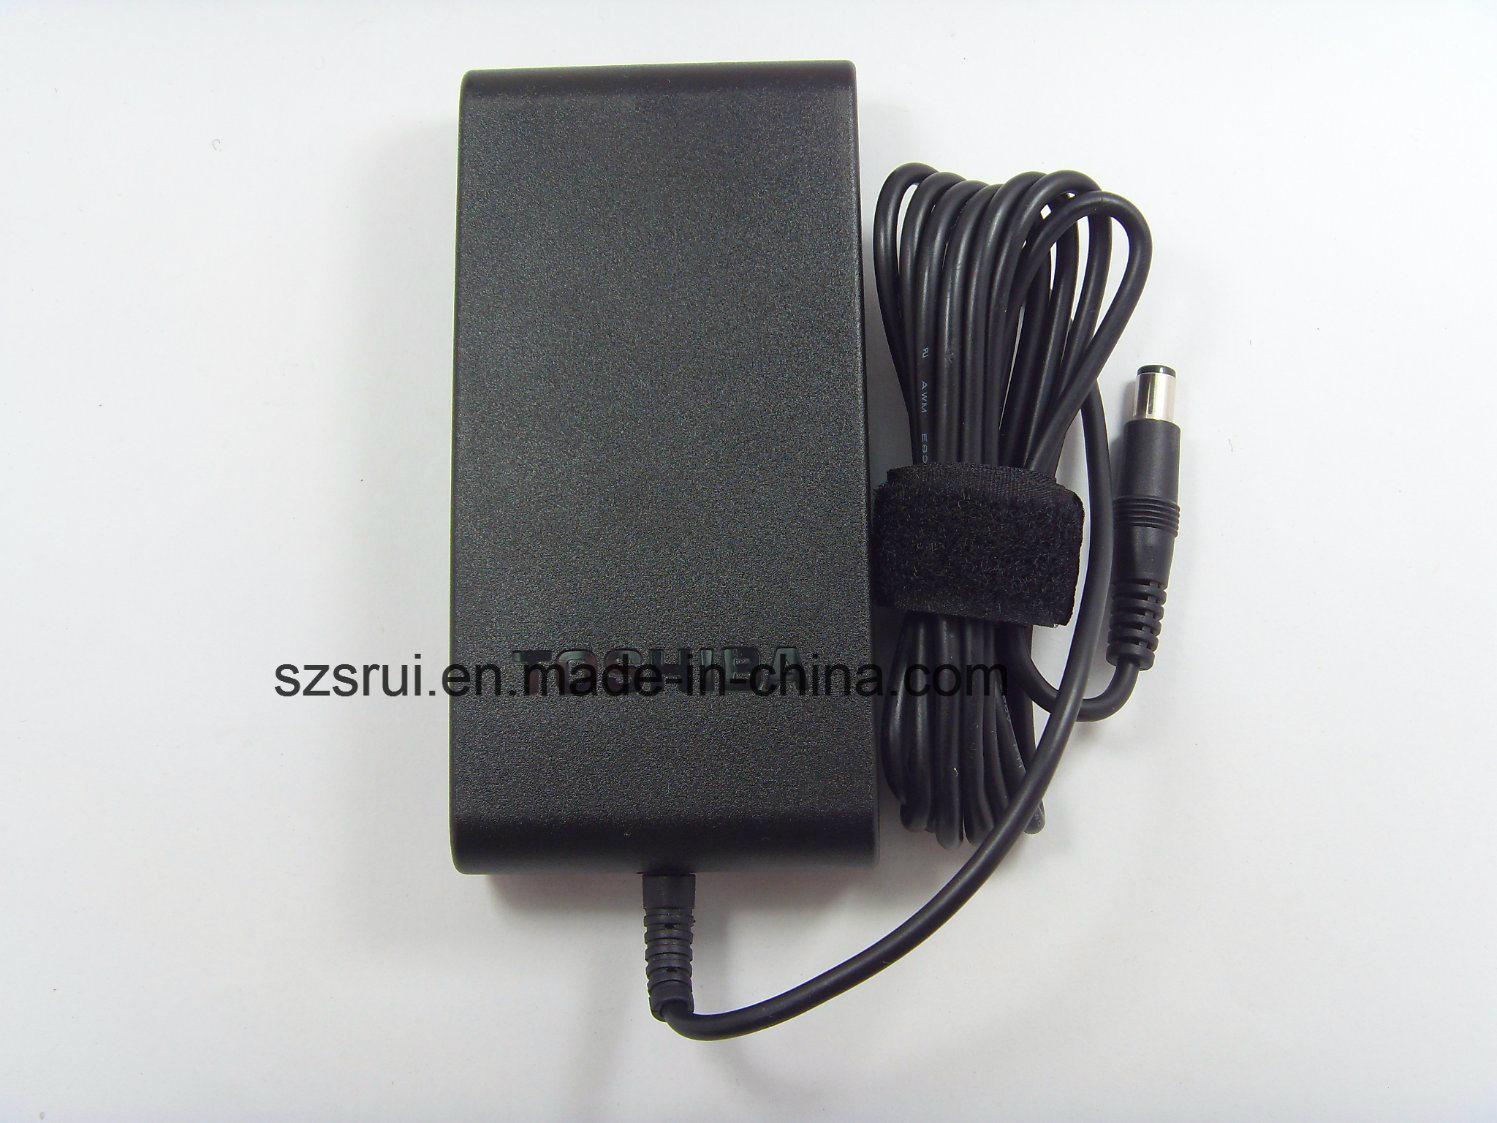 Toshiba 15V 5A AC Charger PA3201-1aca, PA3283u-1aca, PA3083u-1aca, PA3469u 75W